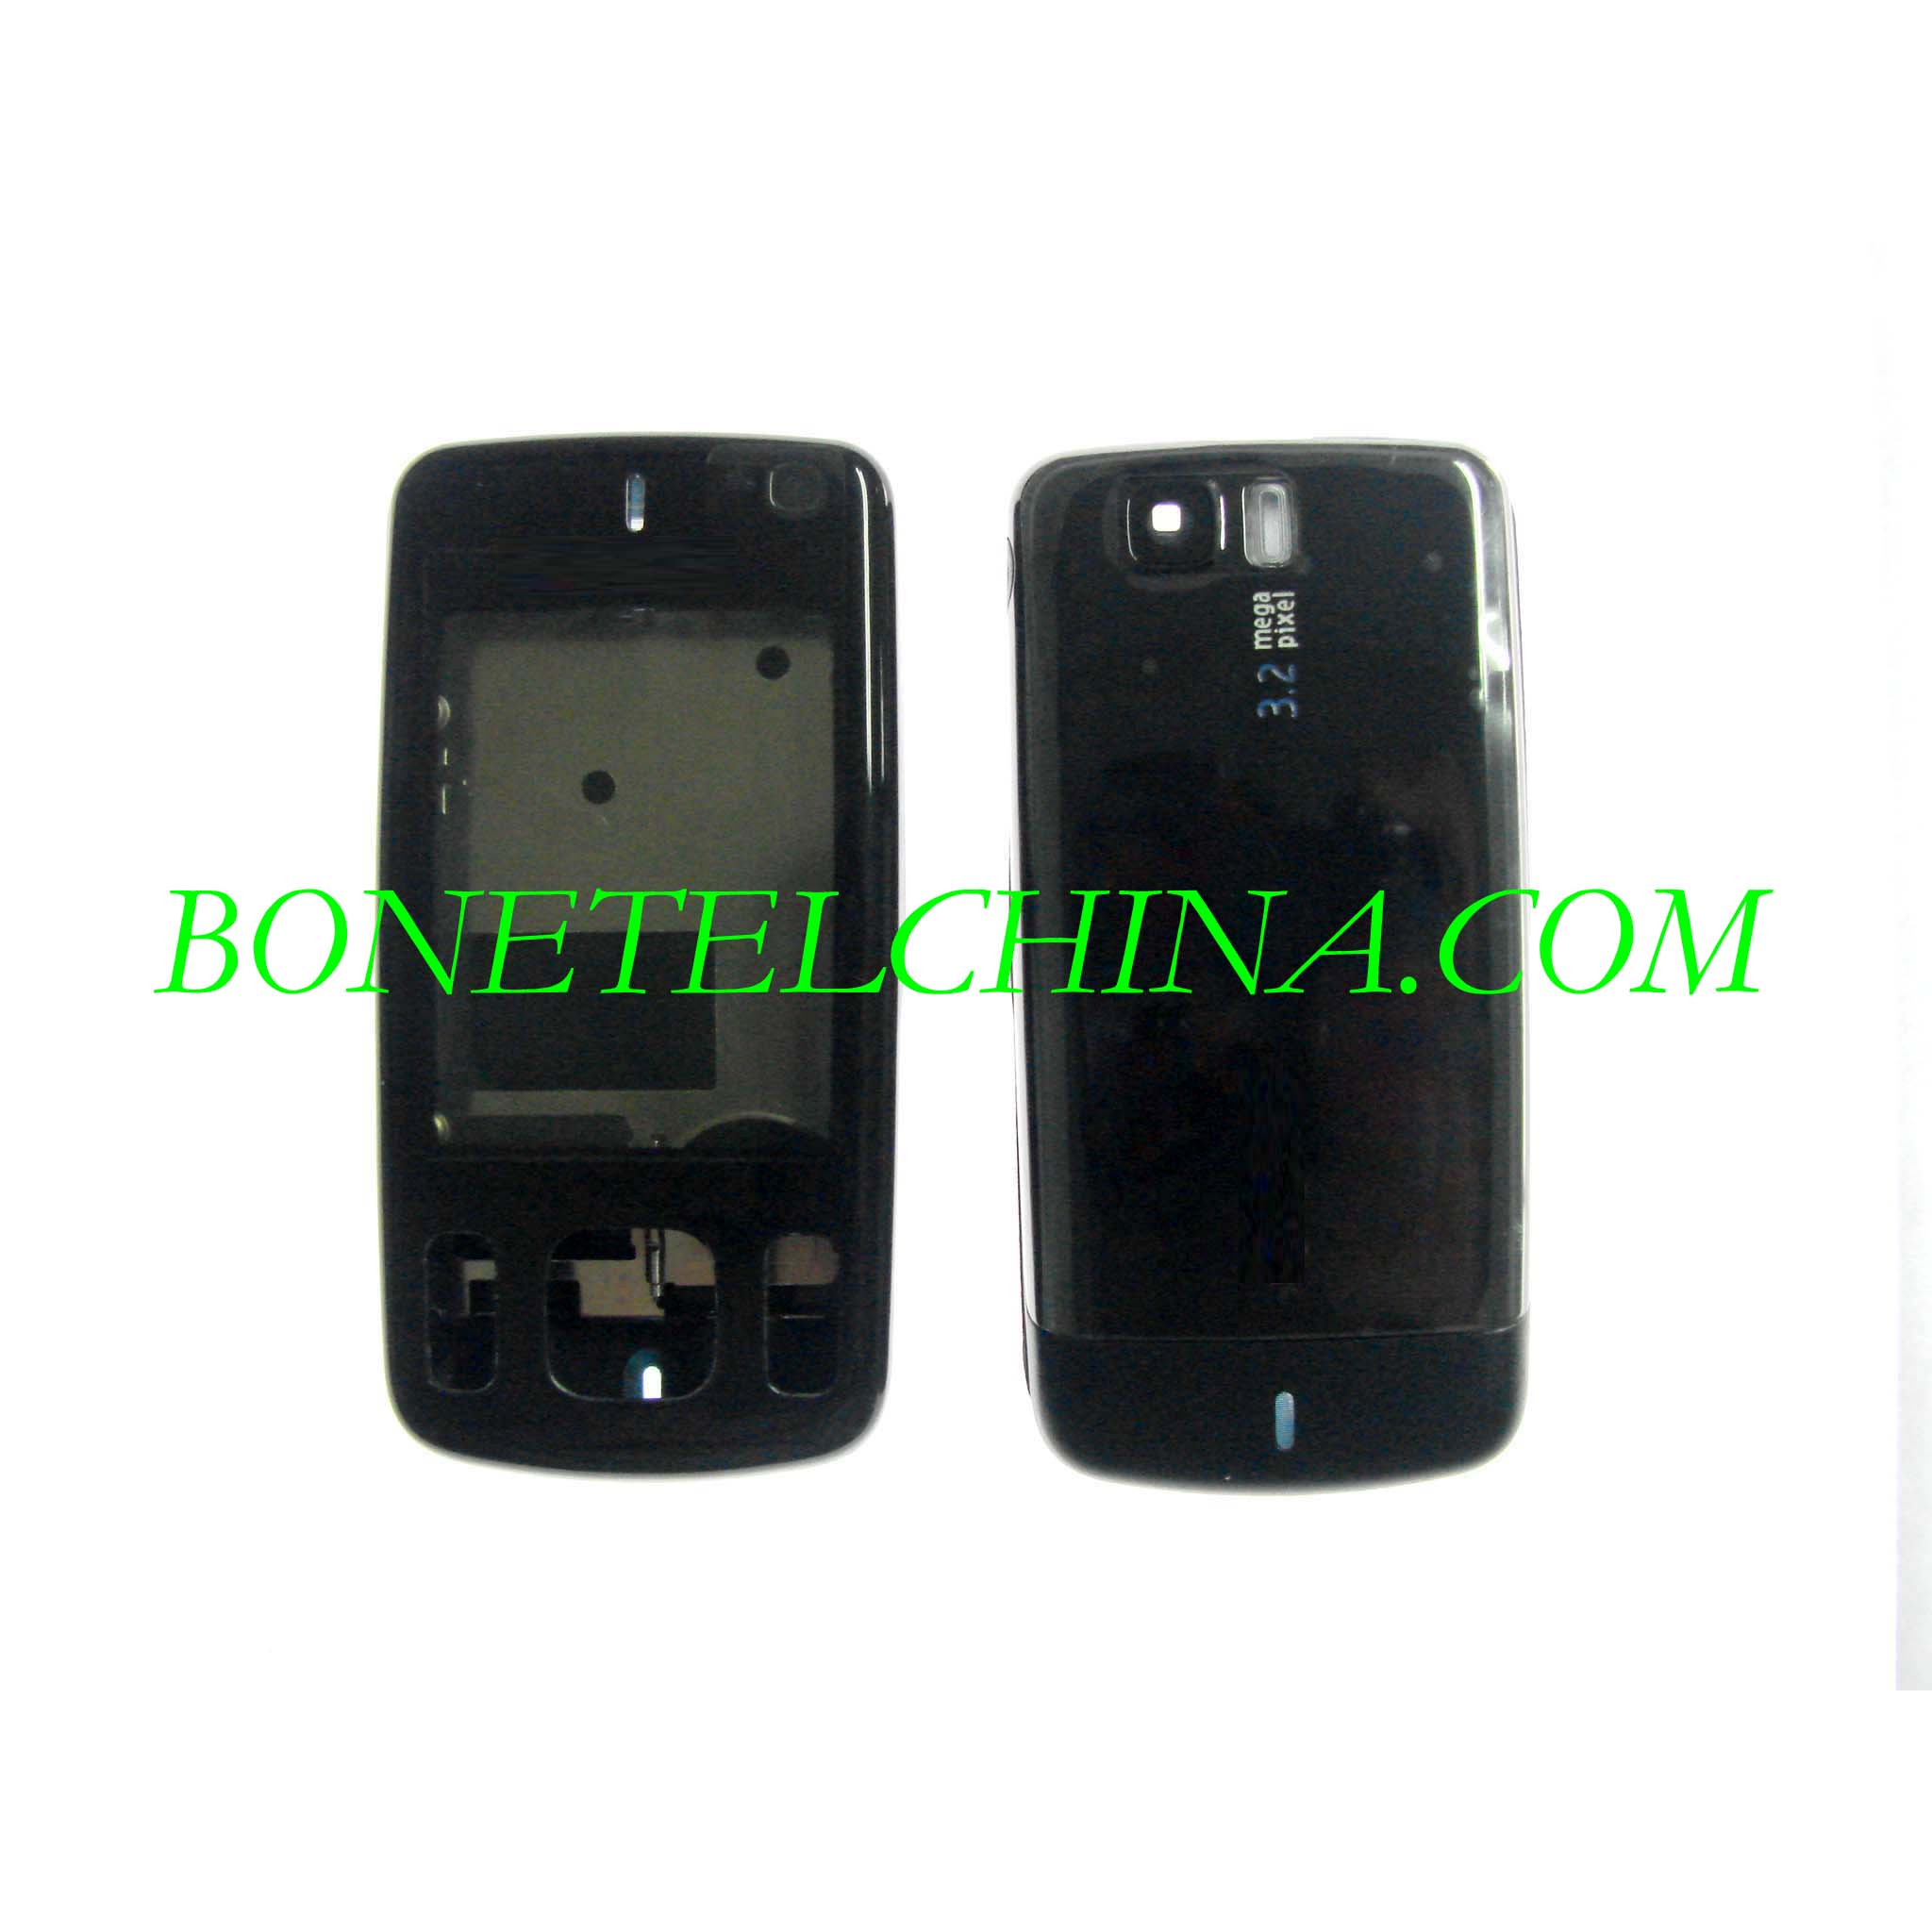 Nokia-Carcasa-BONETEL :: Accesorios para celular Repuestos para ...